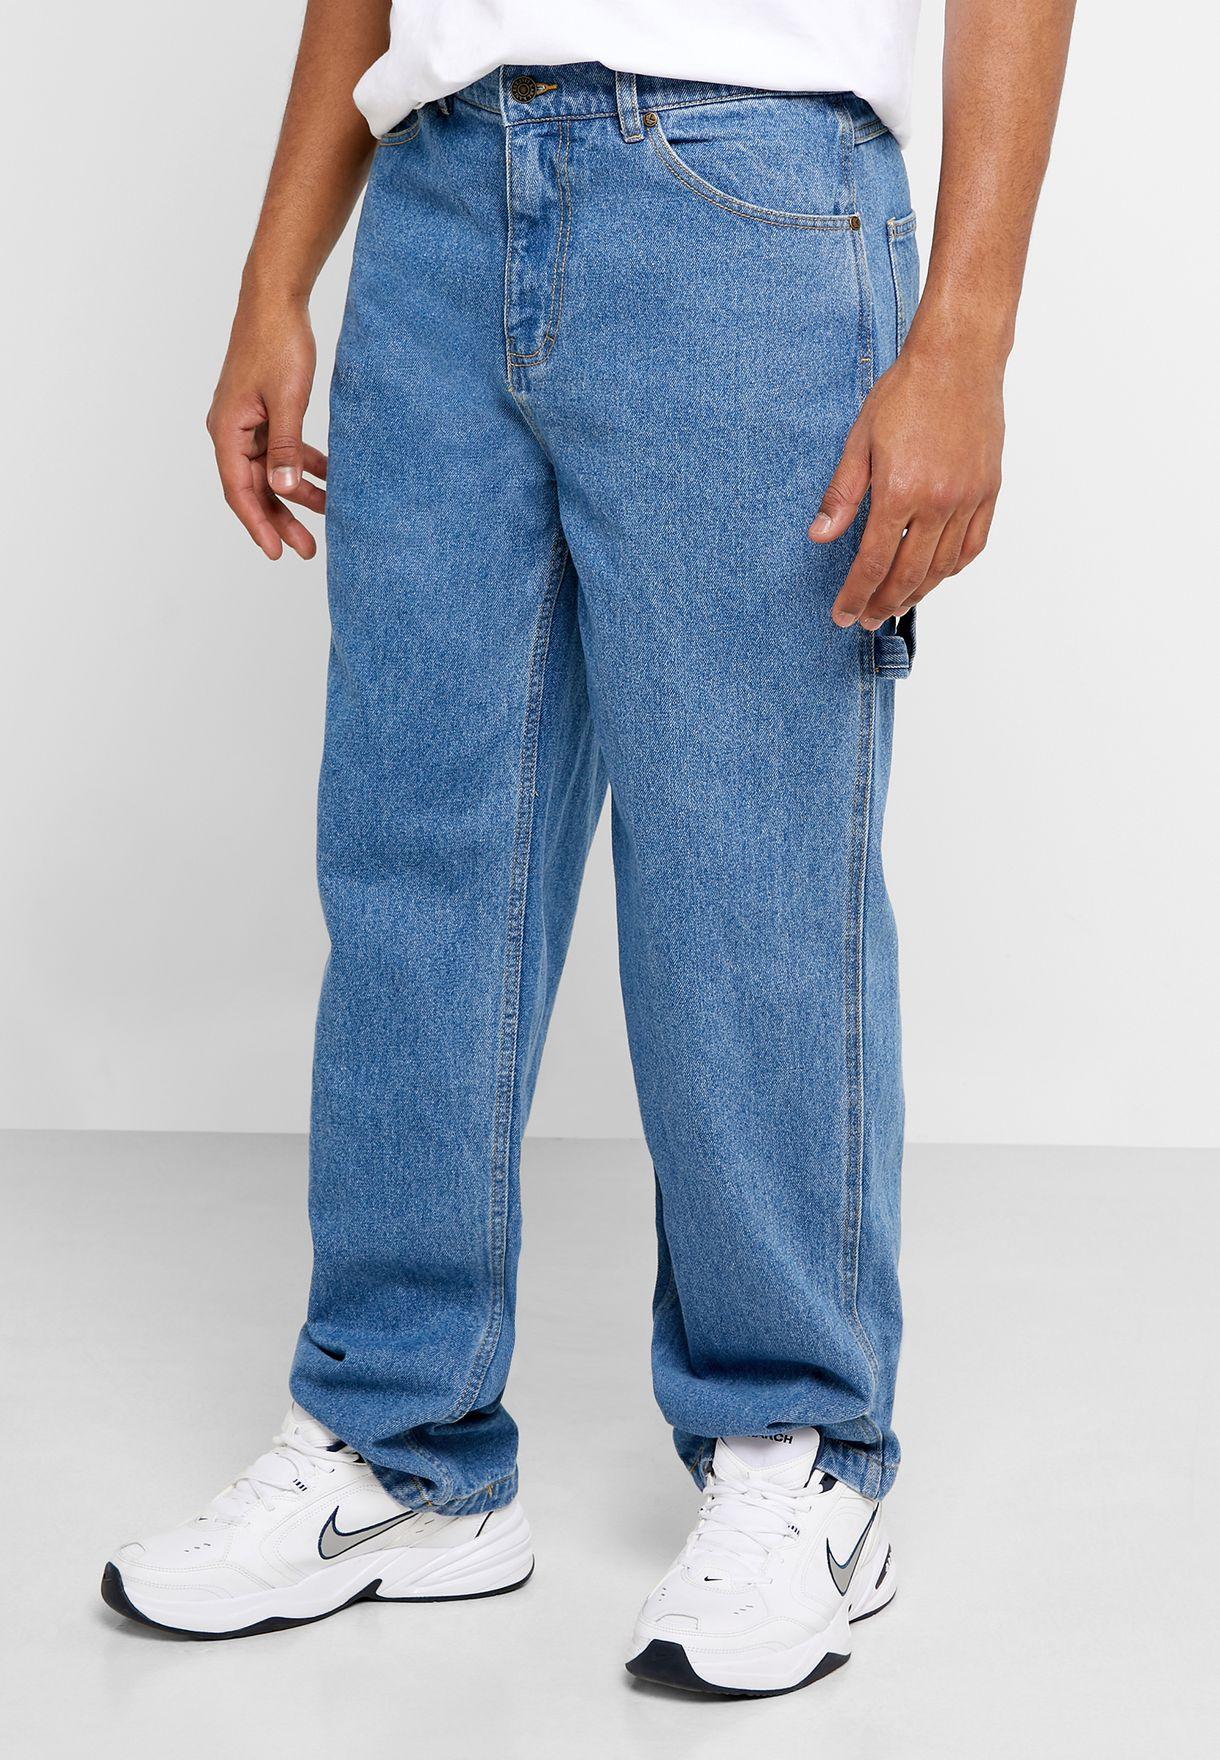 huge discount 0769e a5d49 Denim Baggy Jeans